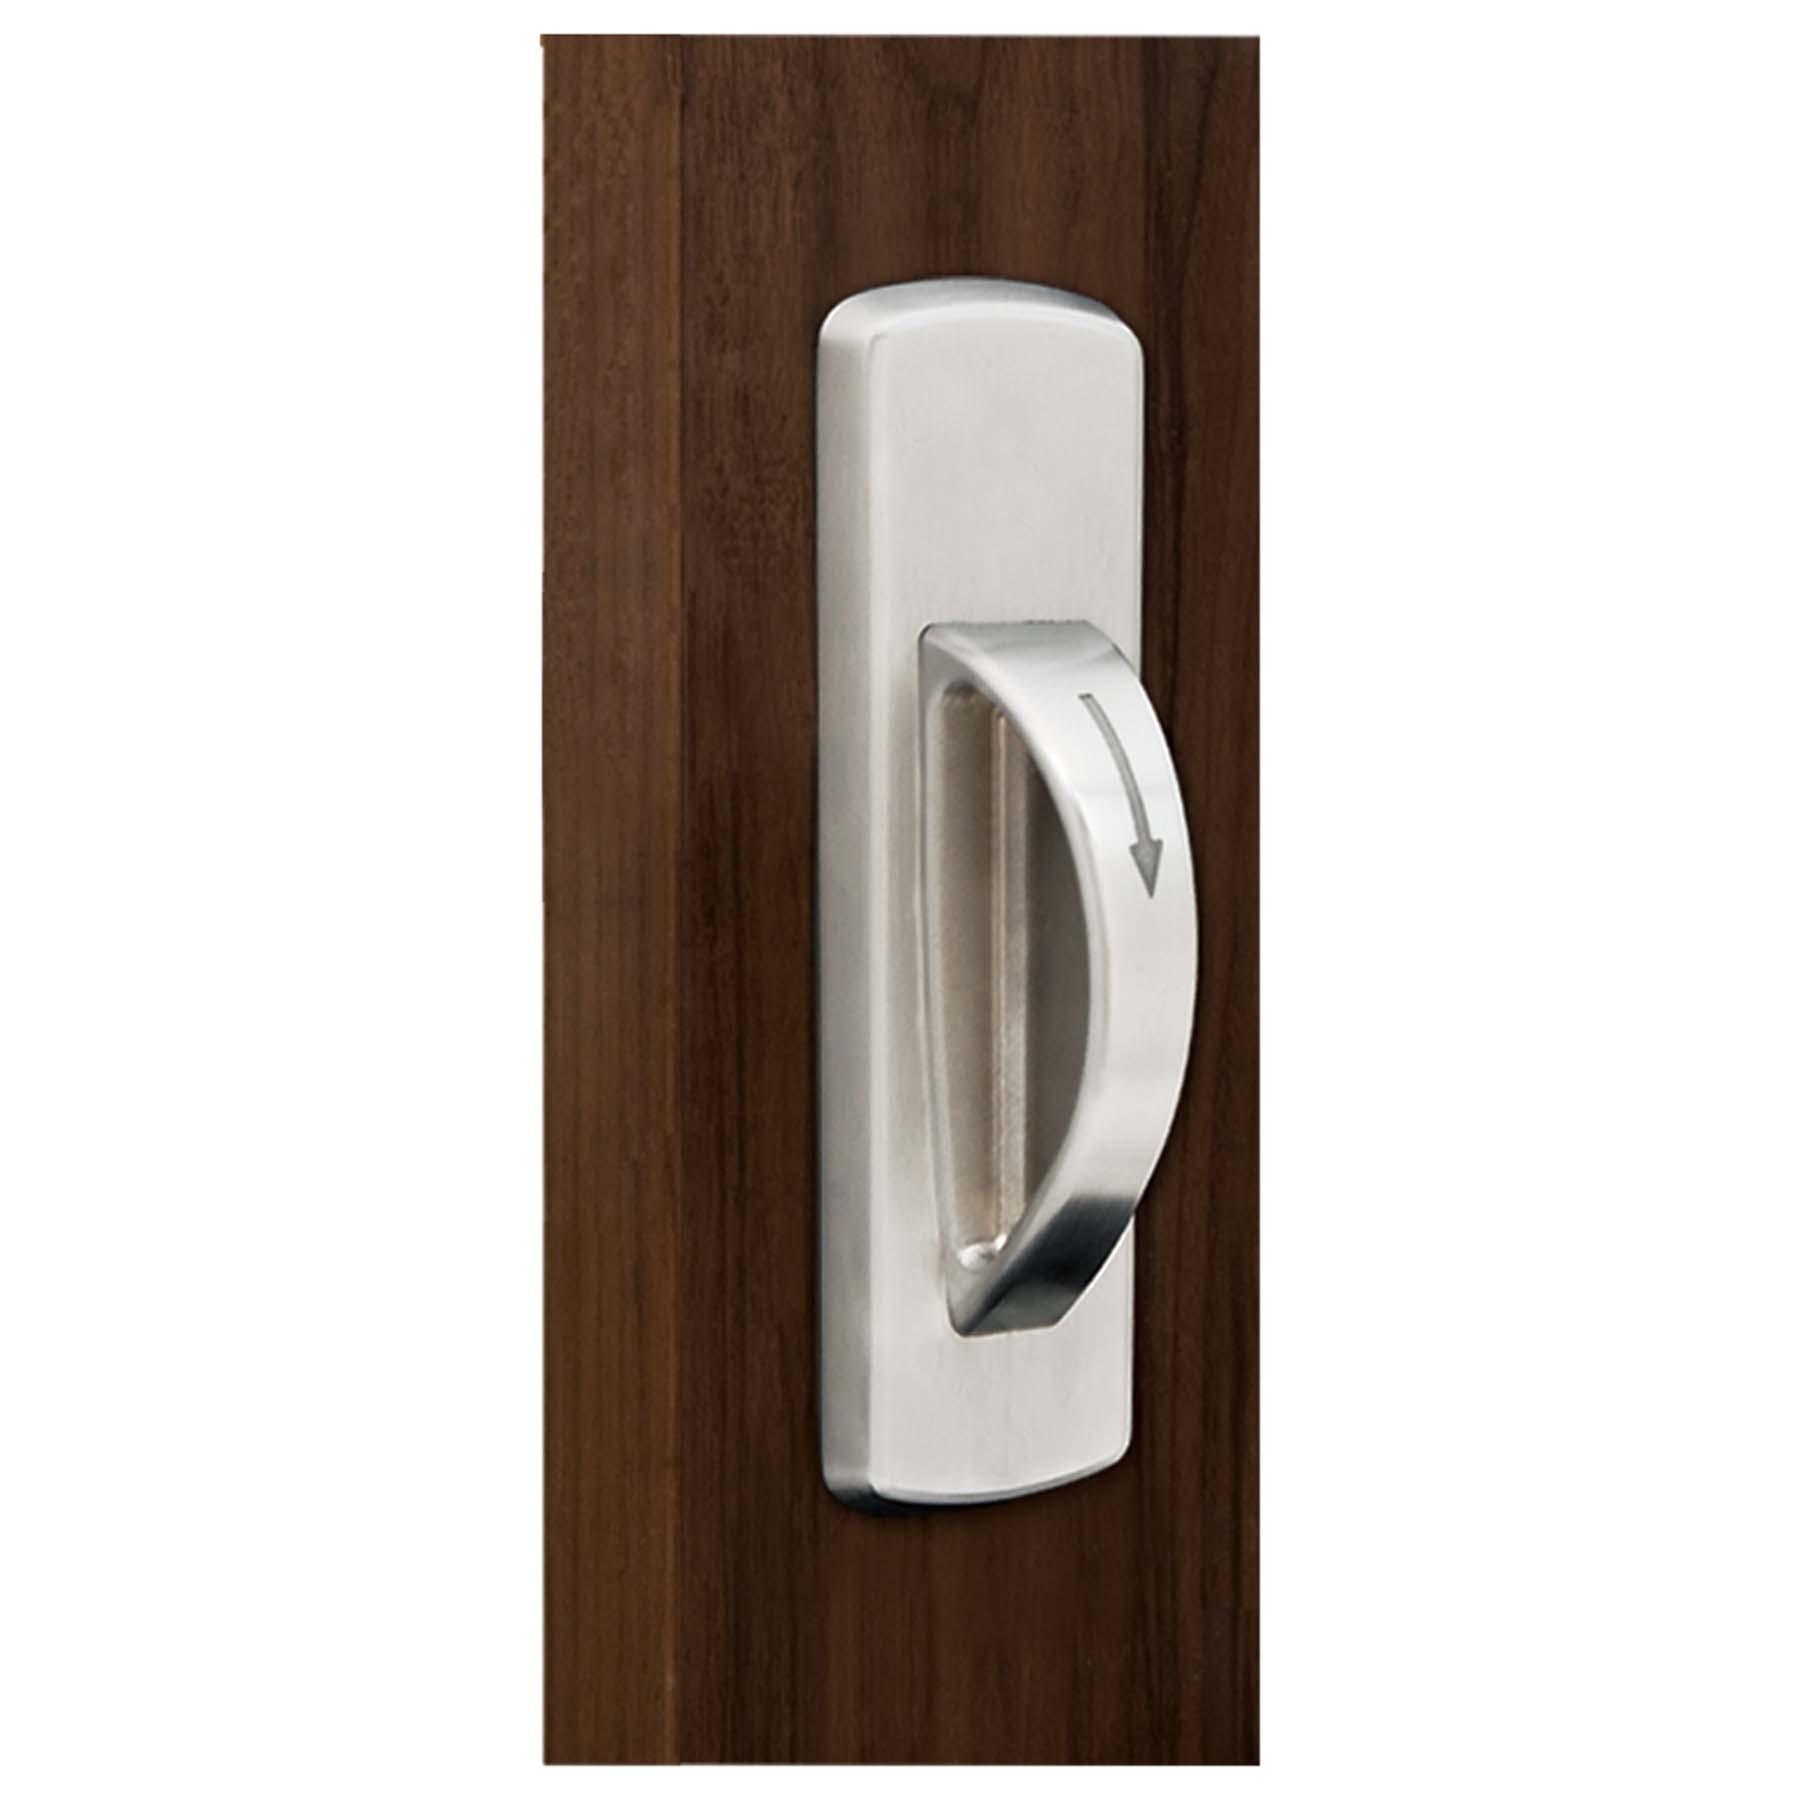 Door Hardware Archives - Behavioral Safety Products   Ligature Resistant